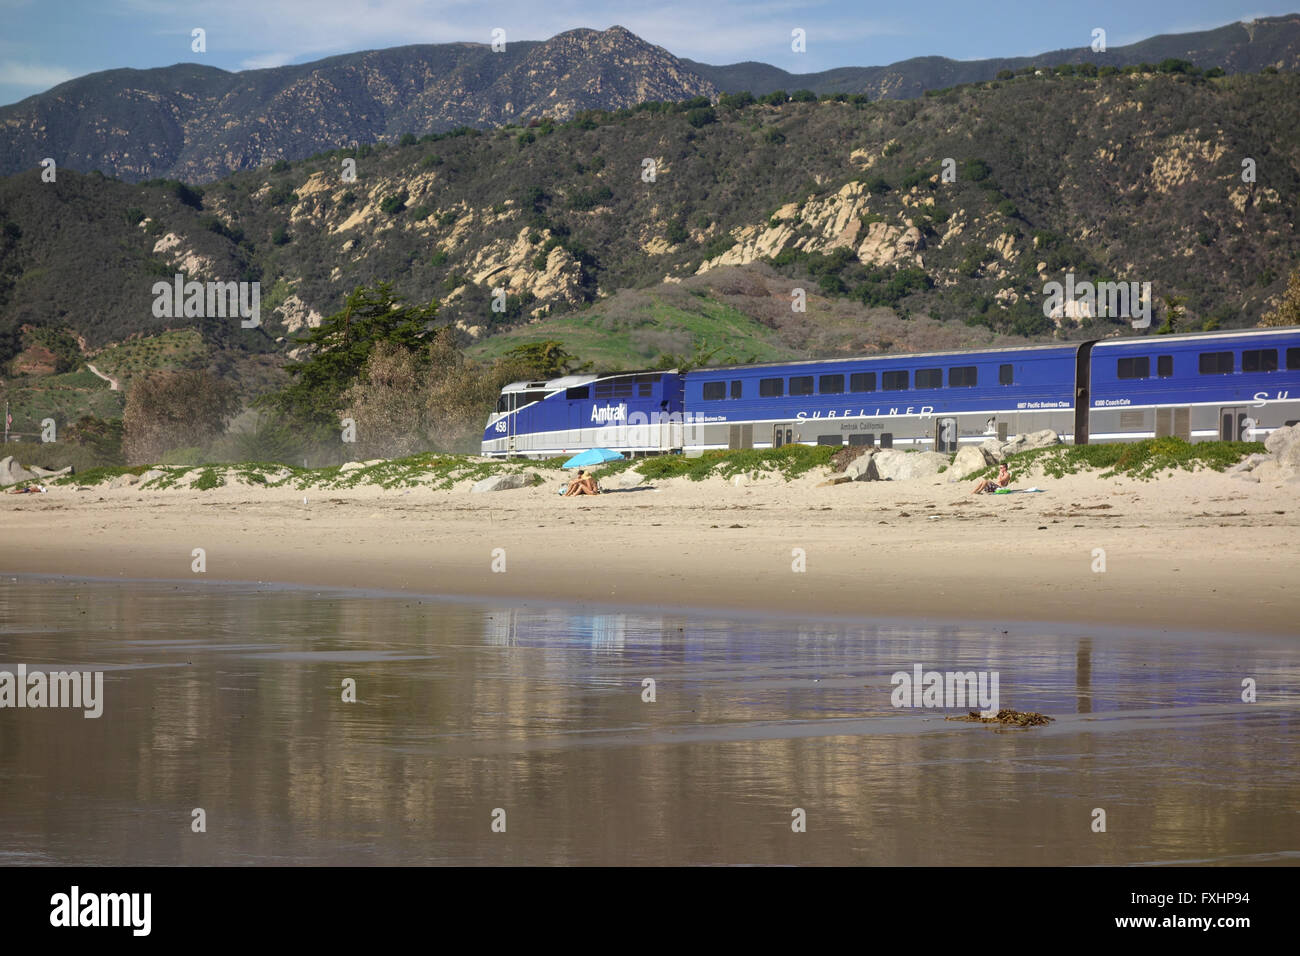 Amtrak Surfliner railroad locomotive on tracks along Pacific Ocean coast near Carpinteria in Southern California,United - Stock Image